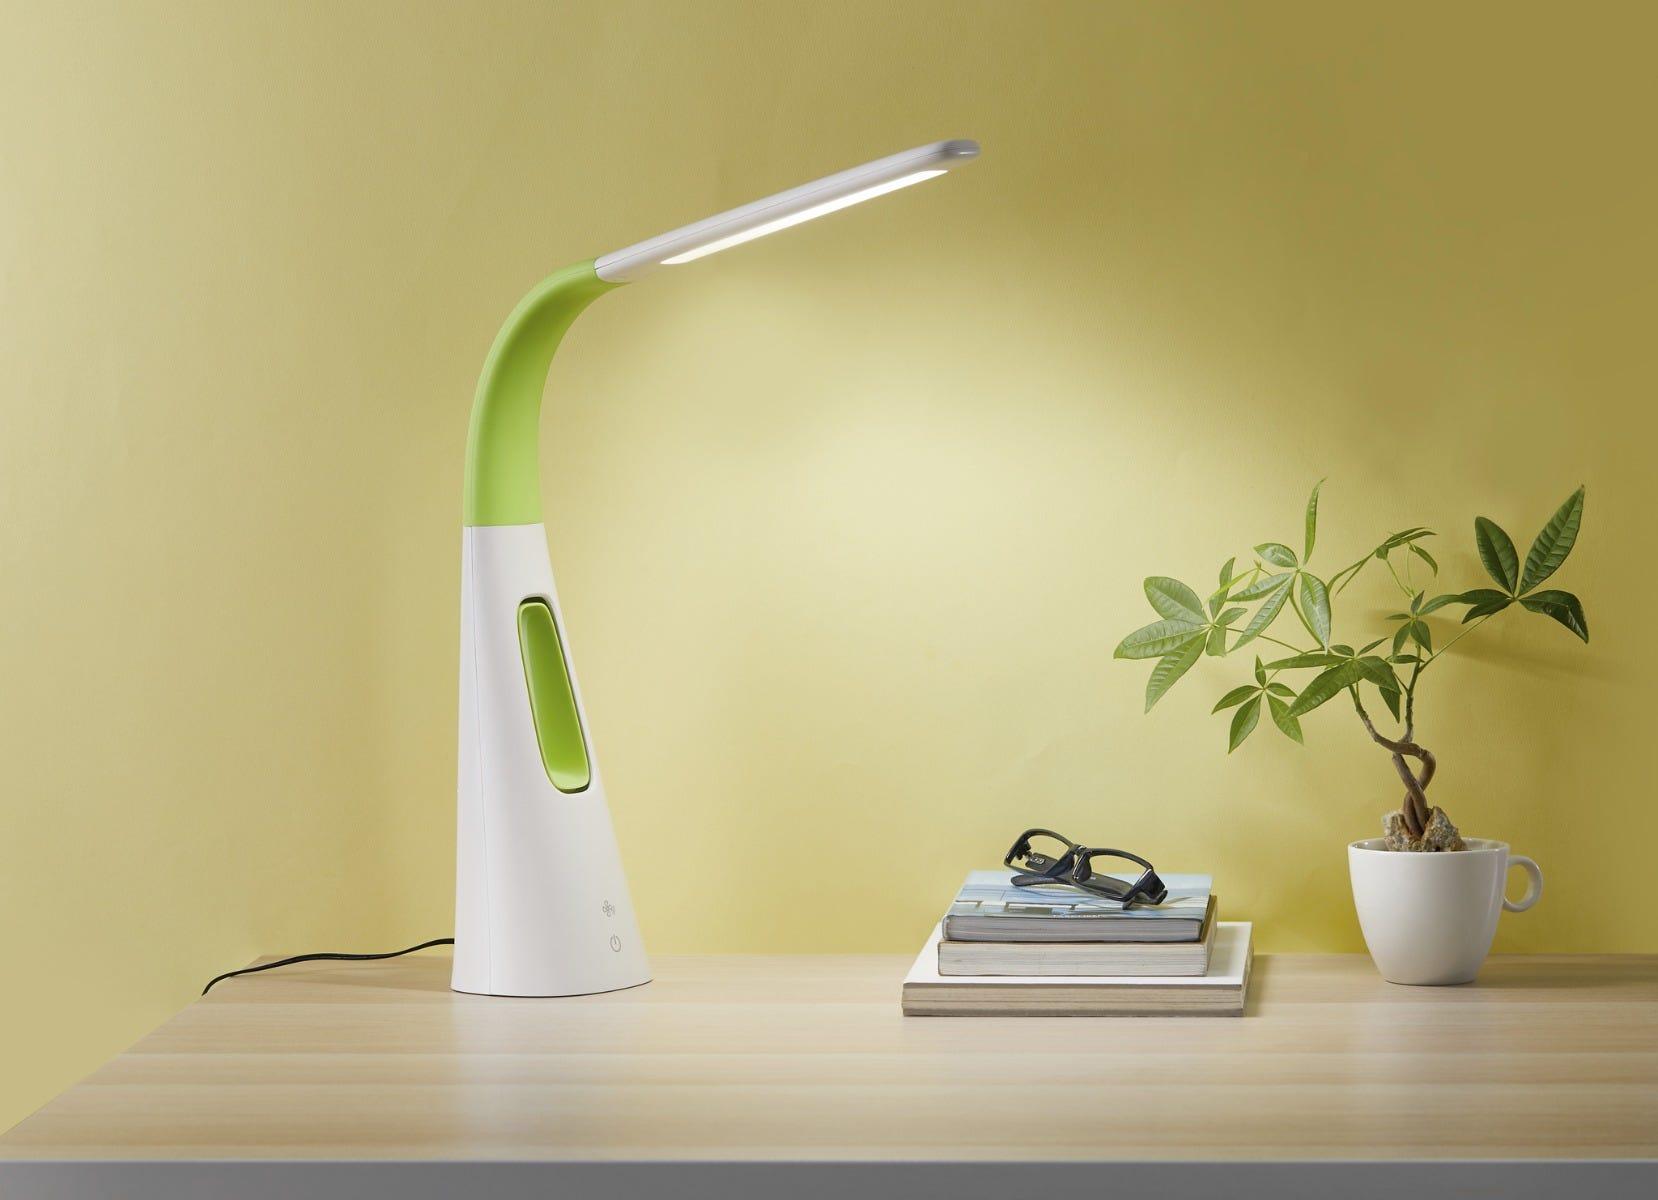 LED desk lamp with bladeless fan